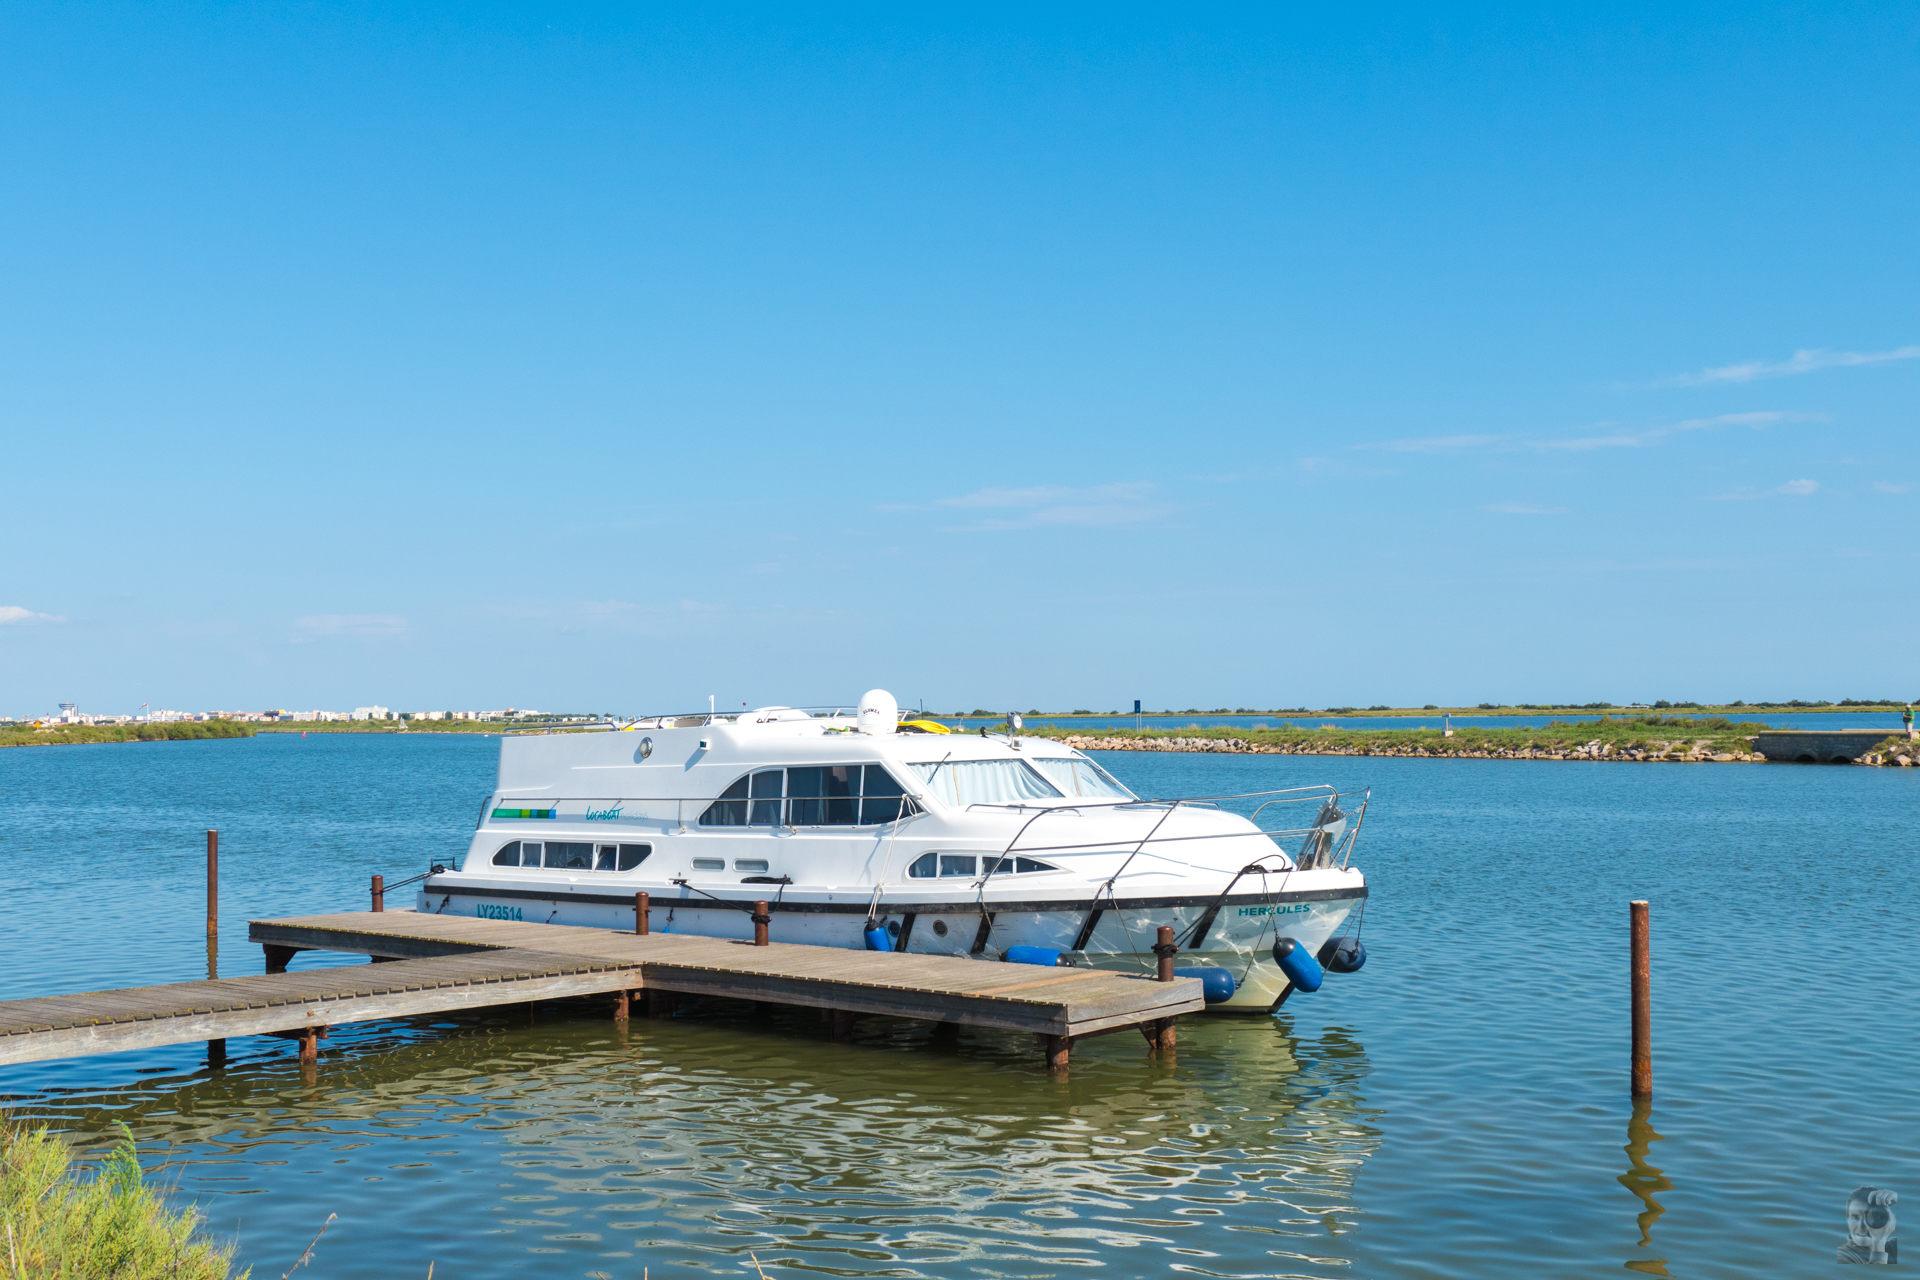 Hausbootferien 2015, Lattes-Europa 600 bei Maguelone